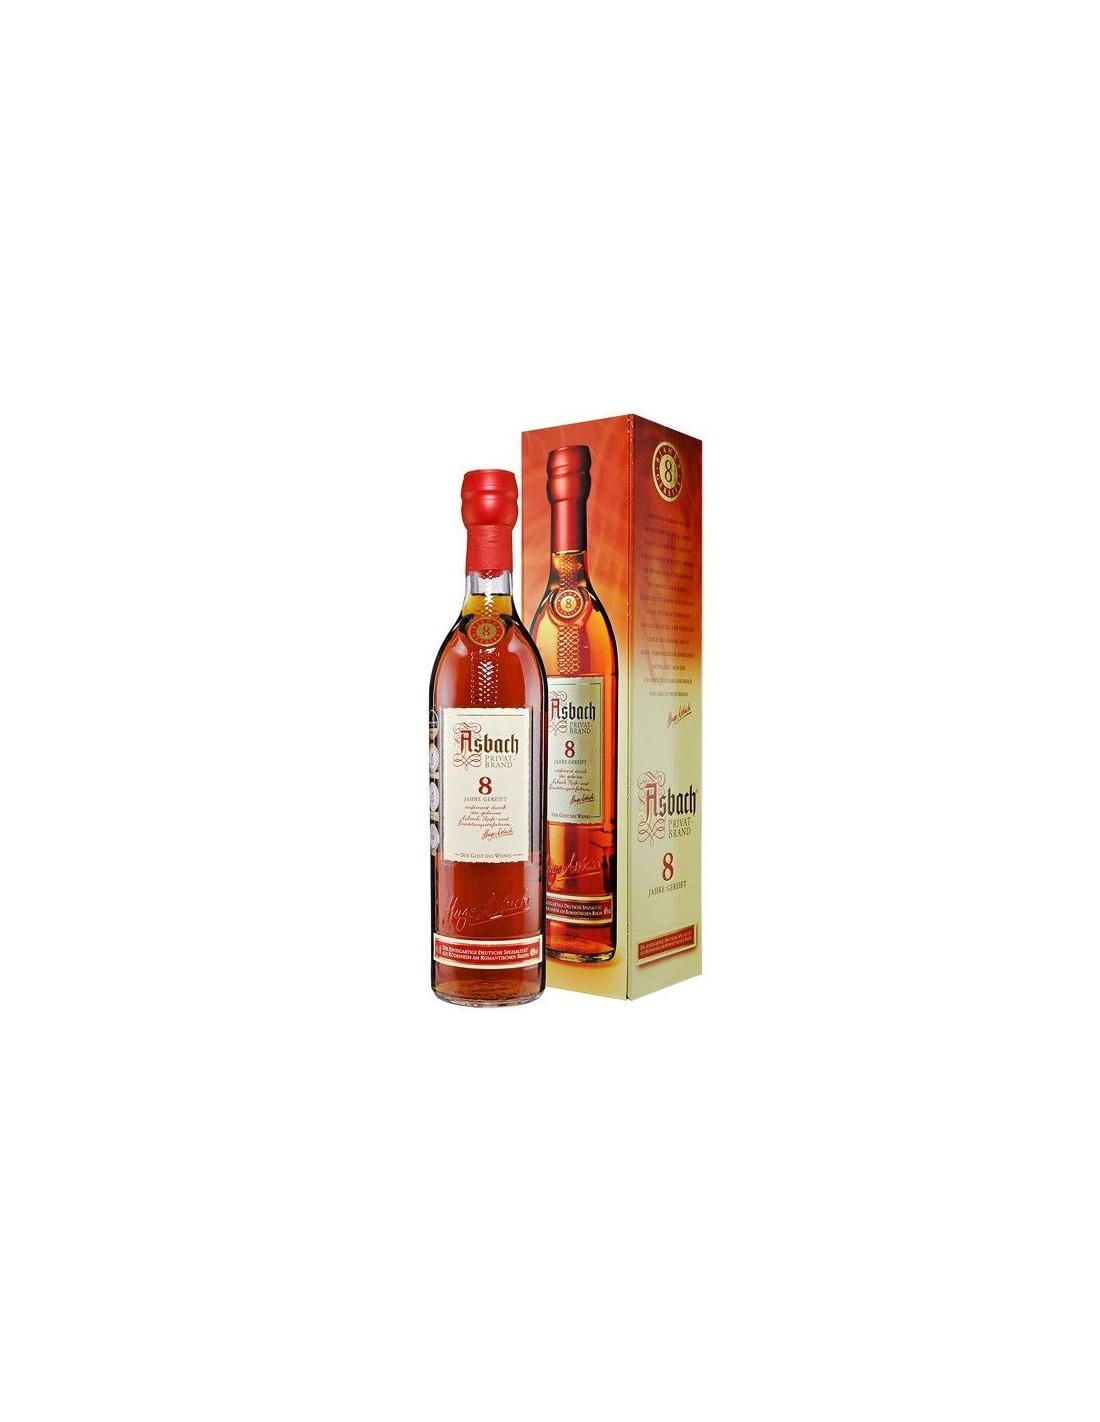 Coniac Brandy Asbach 40% alc., 0.7L, 8 ani, cutie